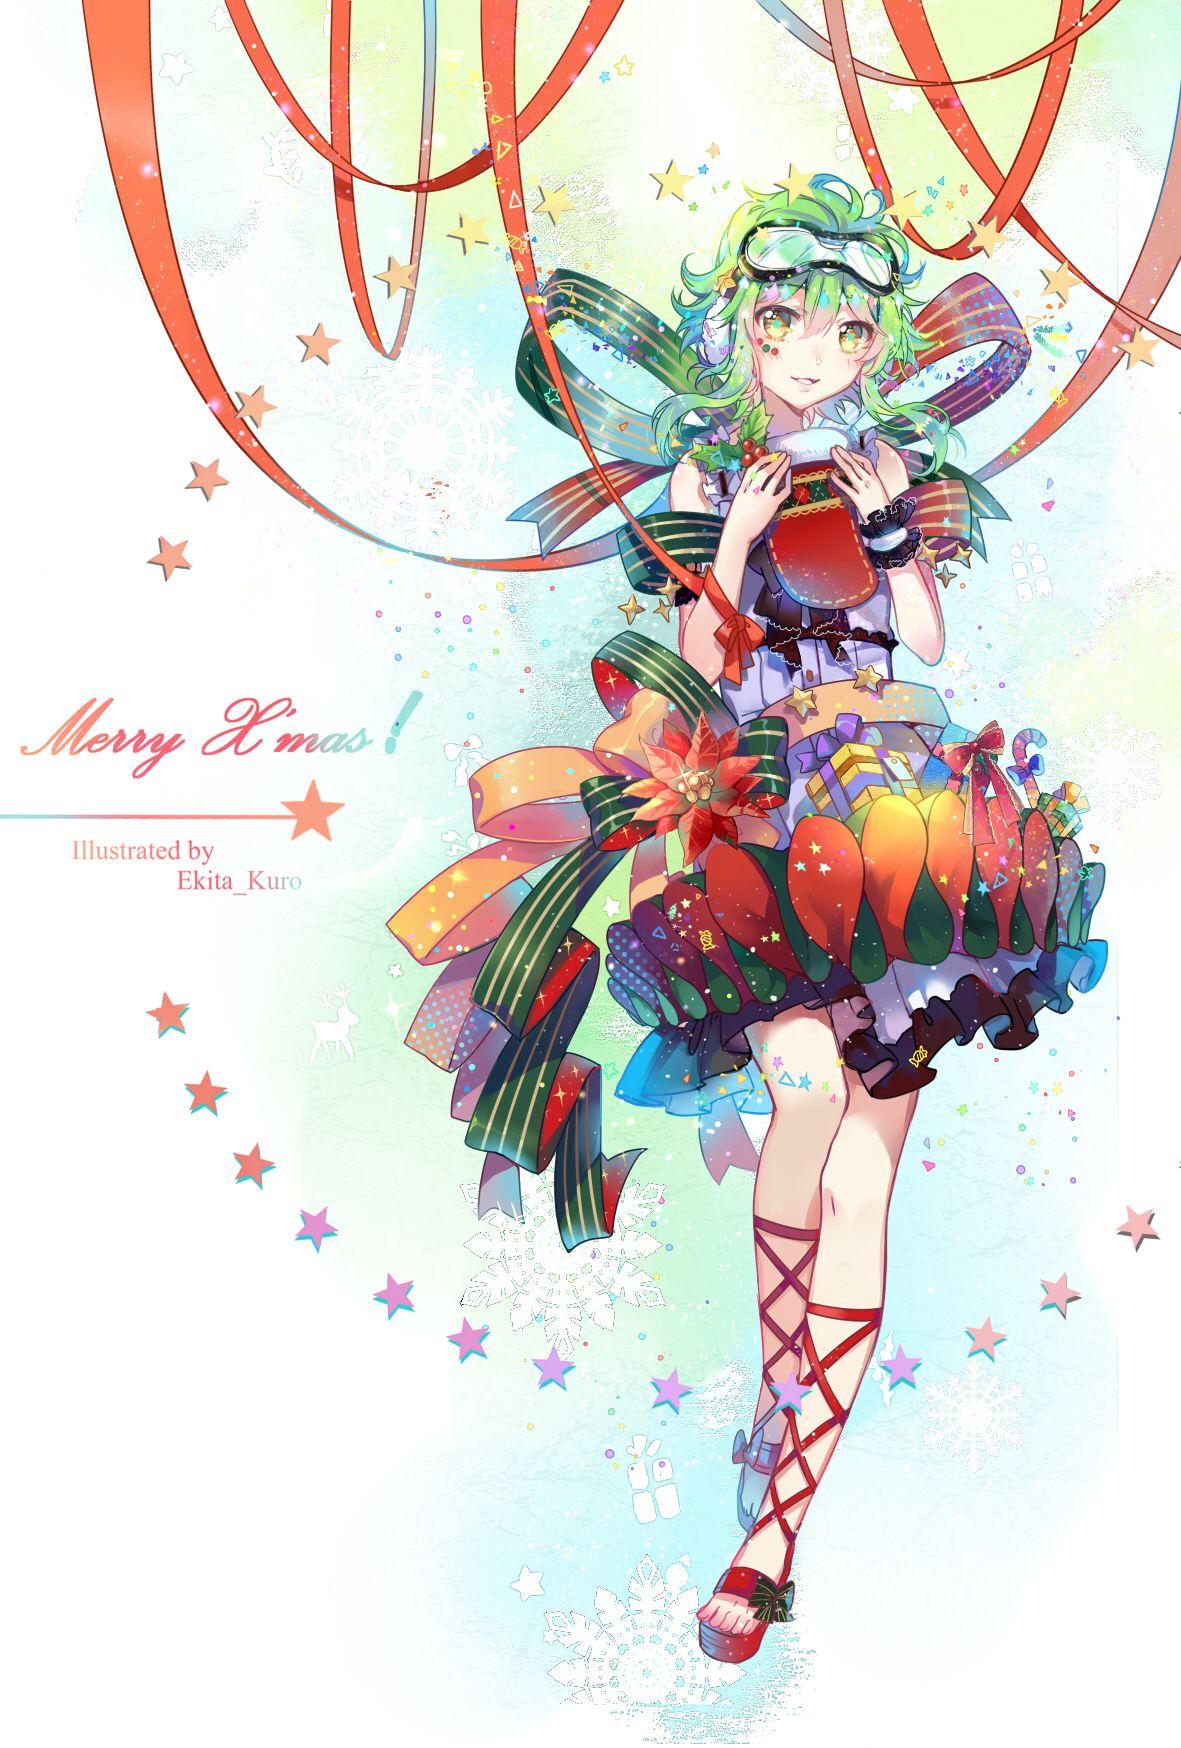 X'mas Miku by Ekita_Kuro Vocaloid, Anime, Anime art